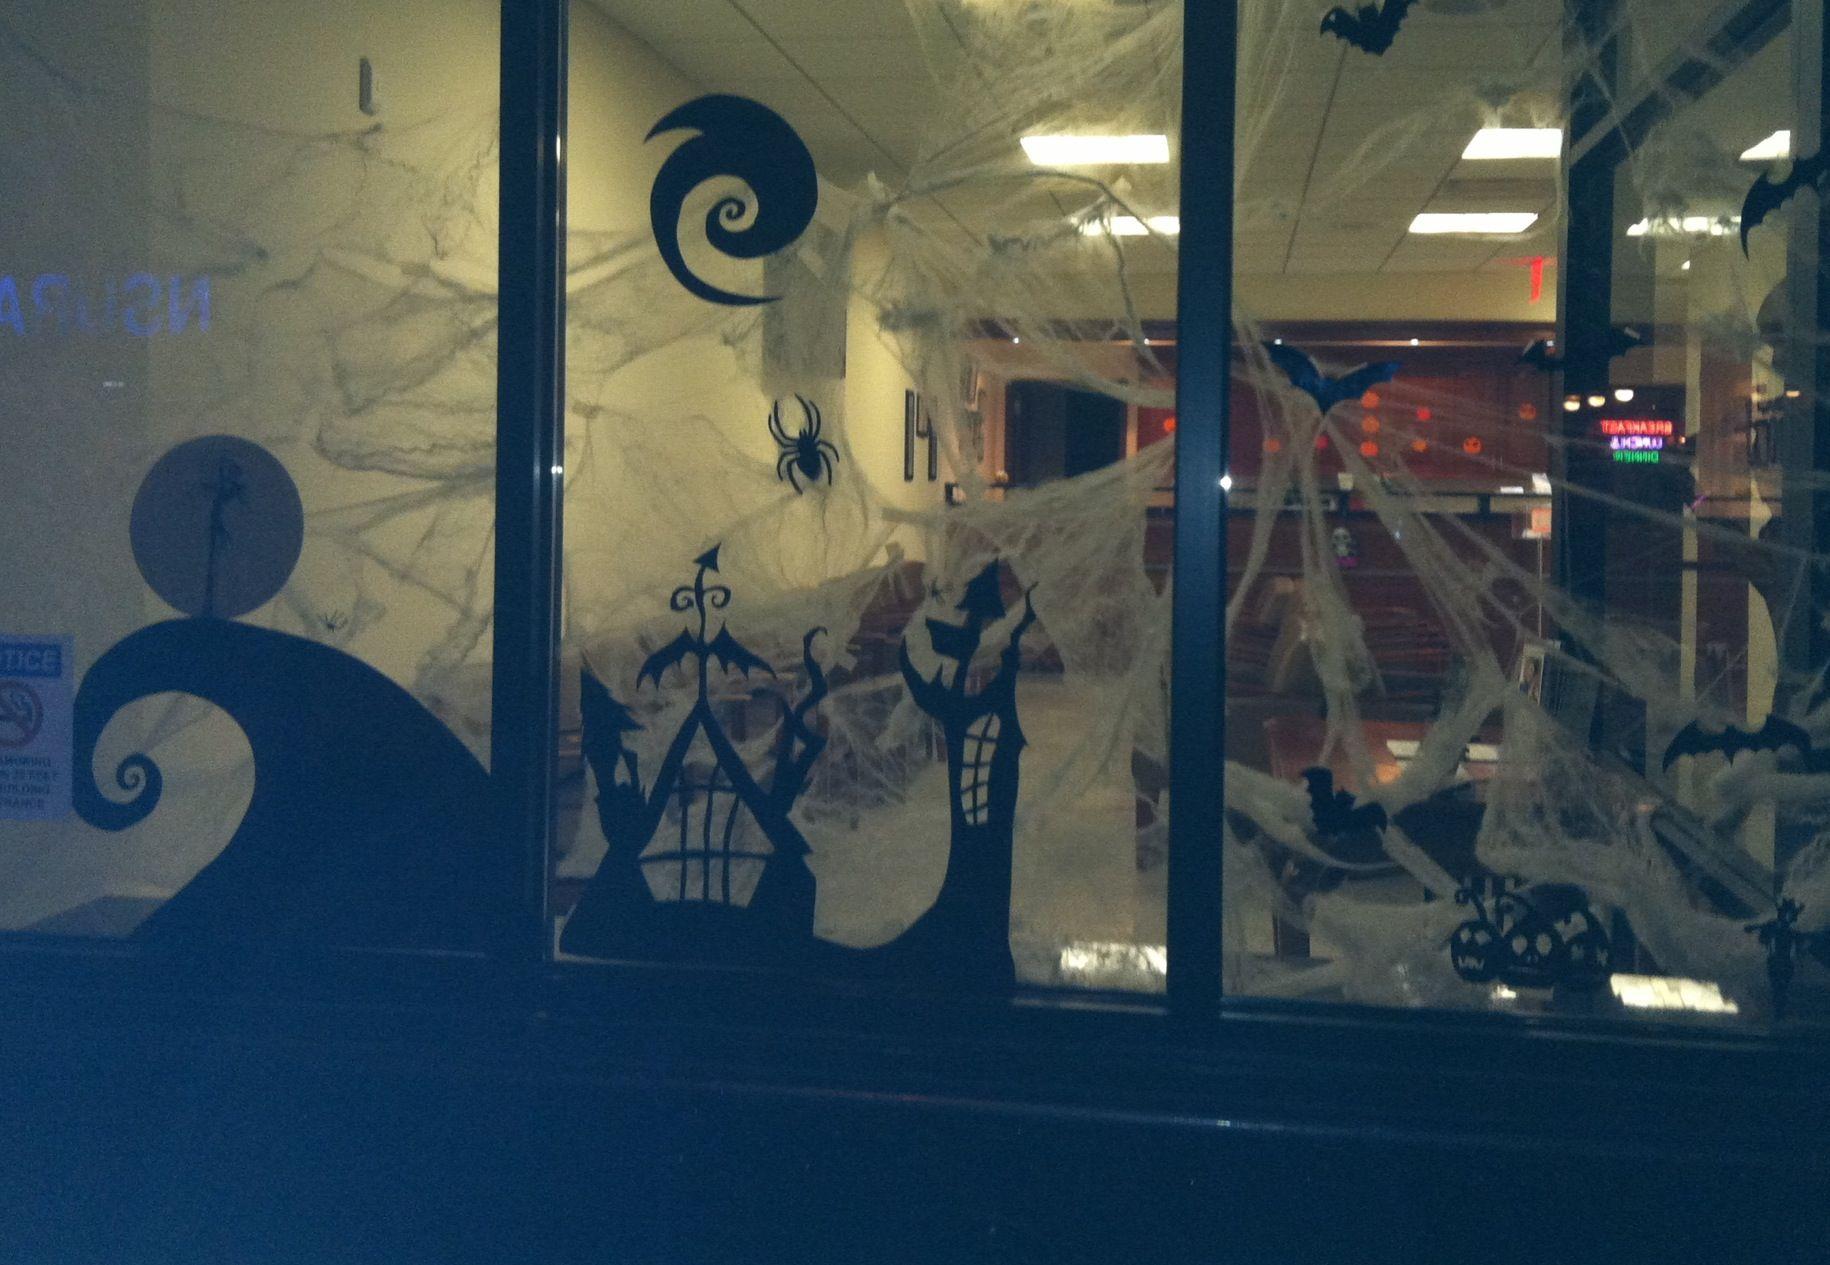 Nightmare before Xmas Halloween decoration in the window